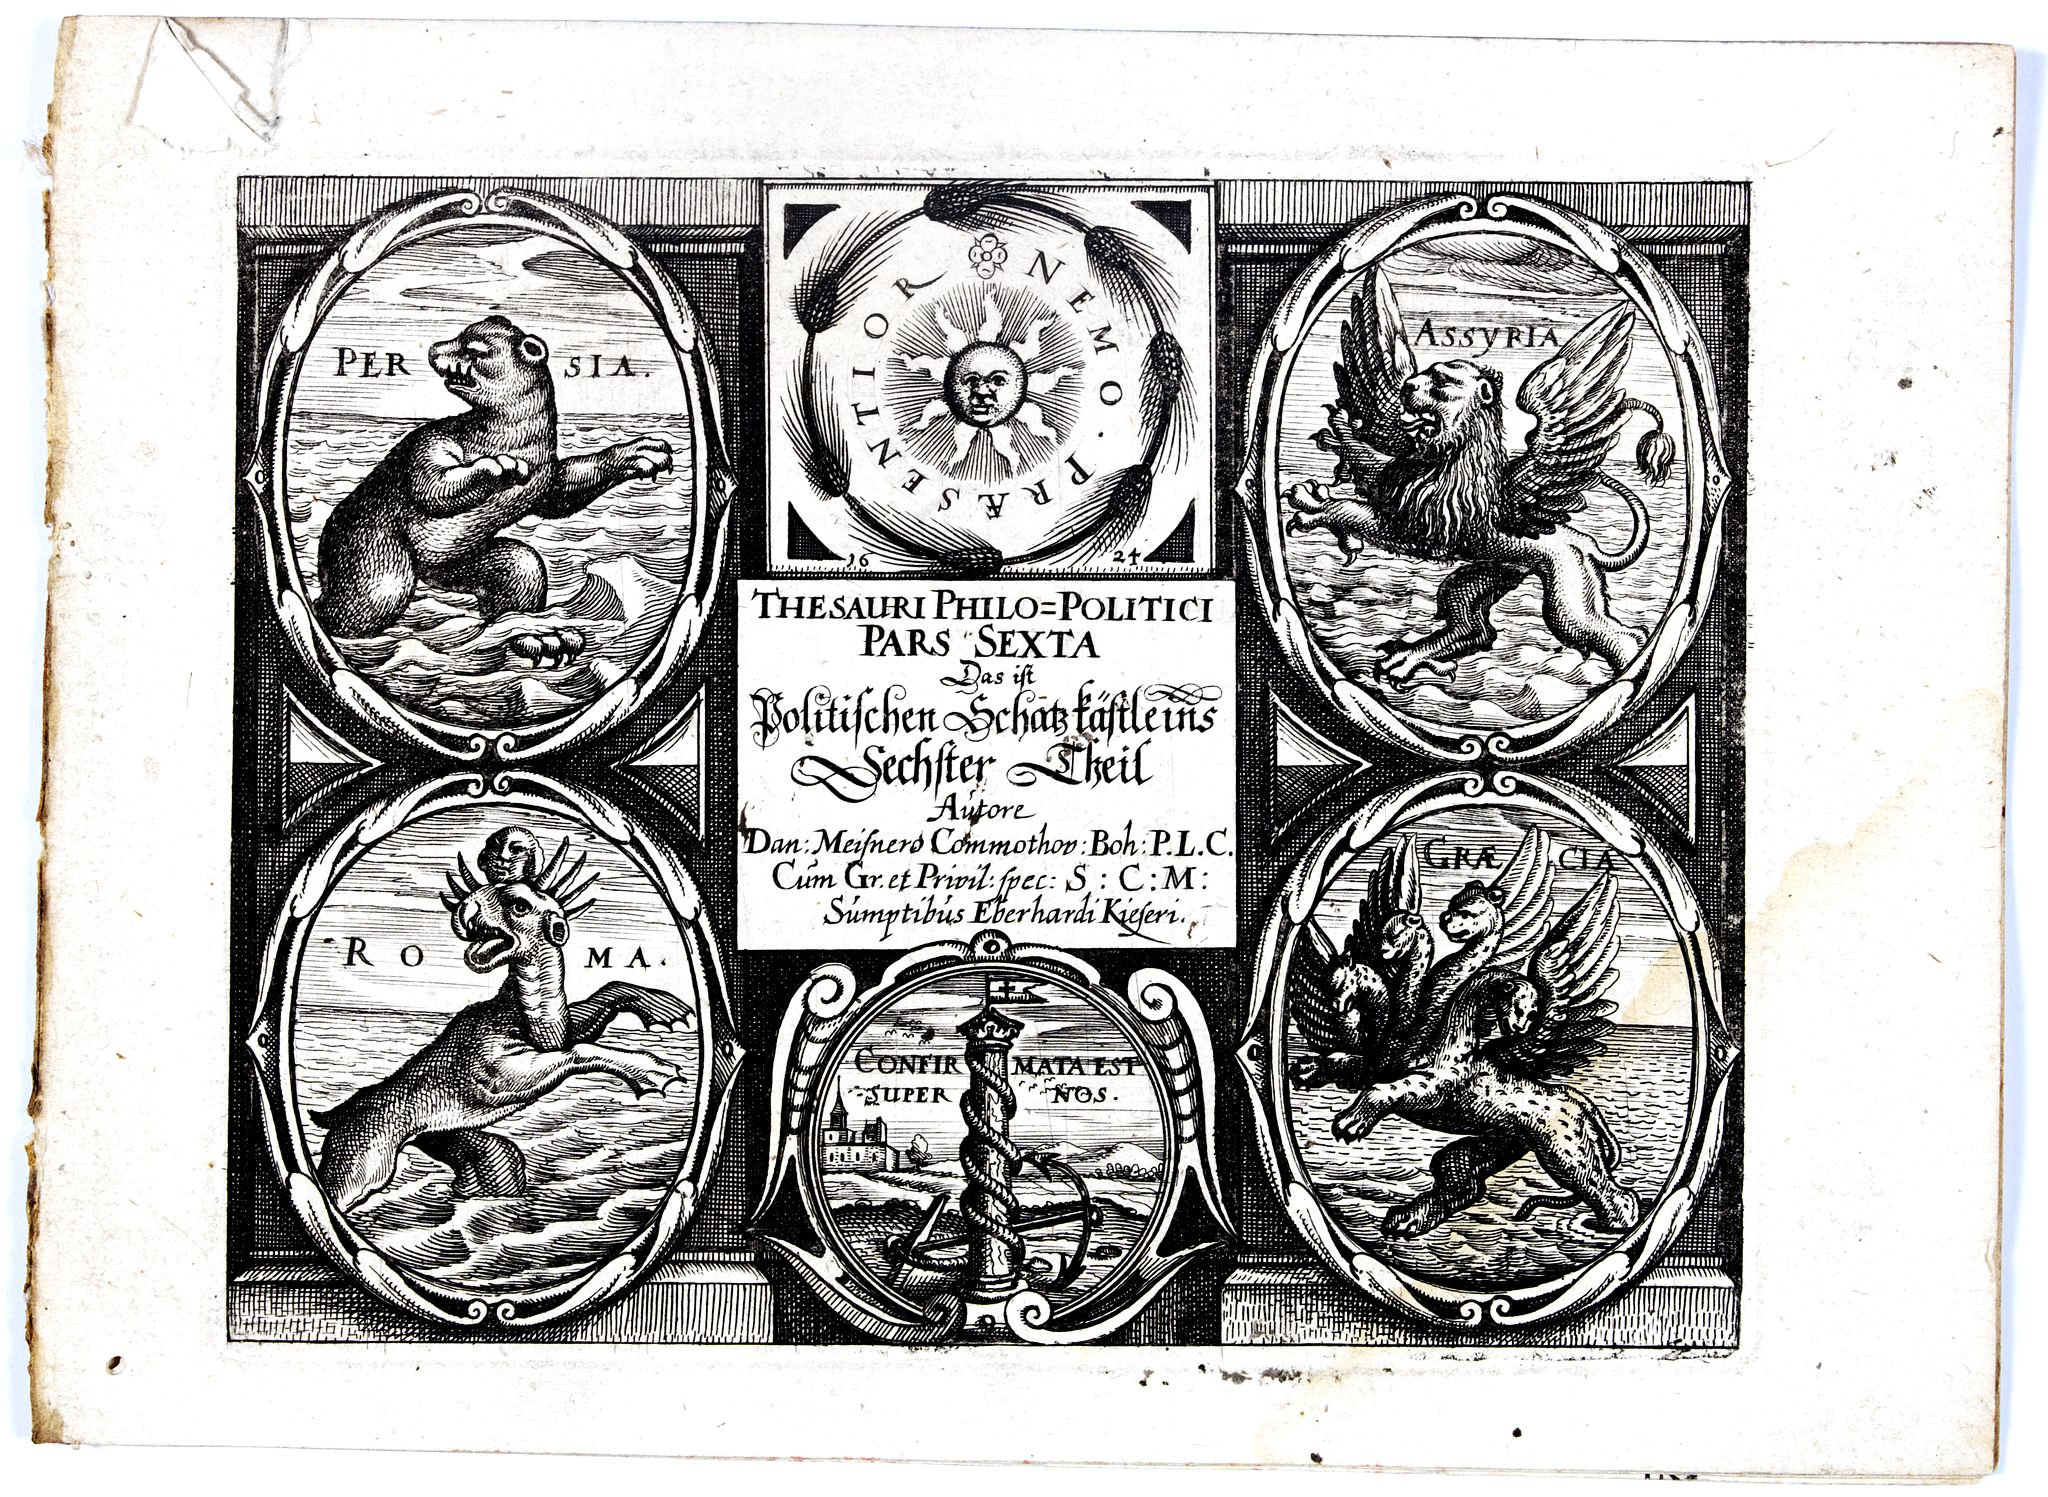 MEISNER, D. -  [Title page] Thesauri Philo-Politci Pars Sexta. . .